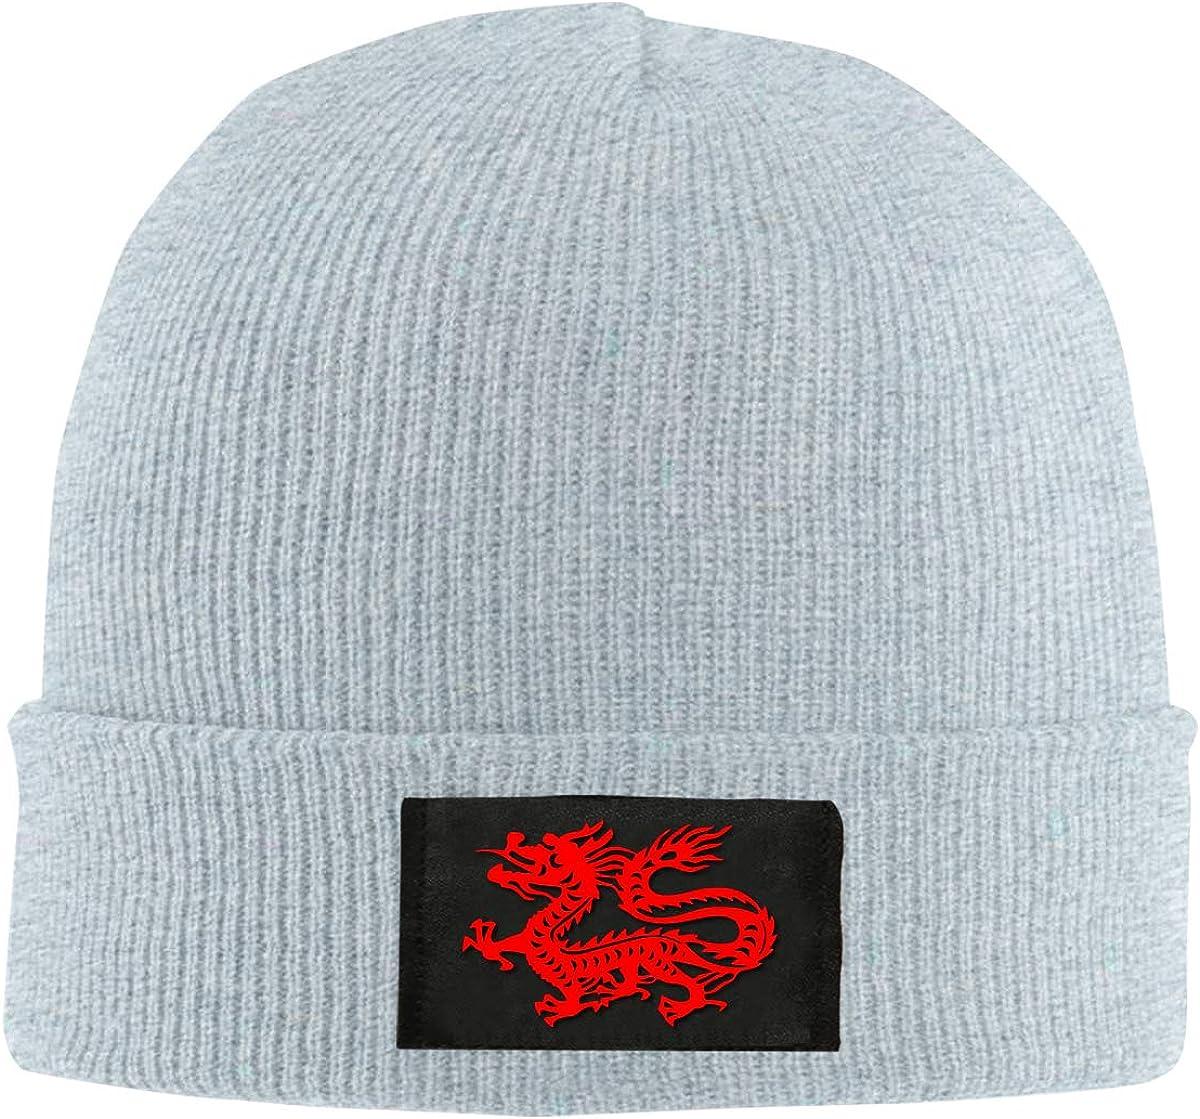 Men Women Hinese Magic Dragon Skull Hat Beanie Cap Winter Knit Hat Cap